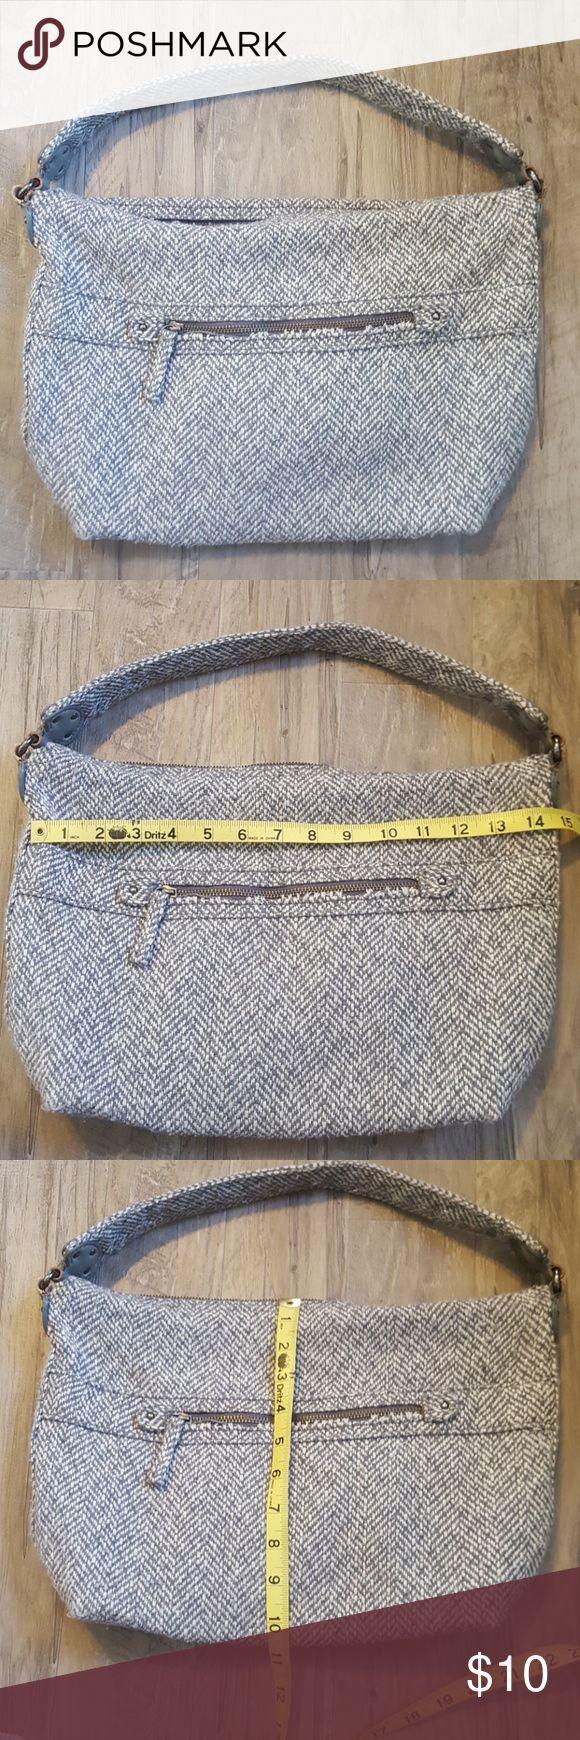 GAP purse Gray twill bag GAP Bags Shoulder Bags